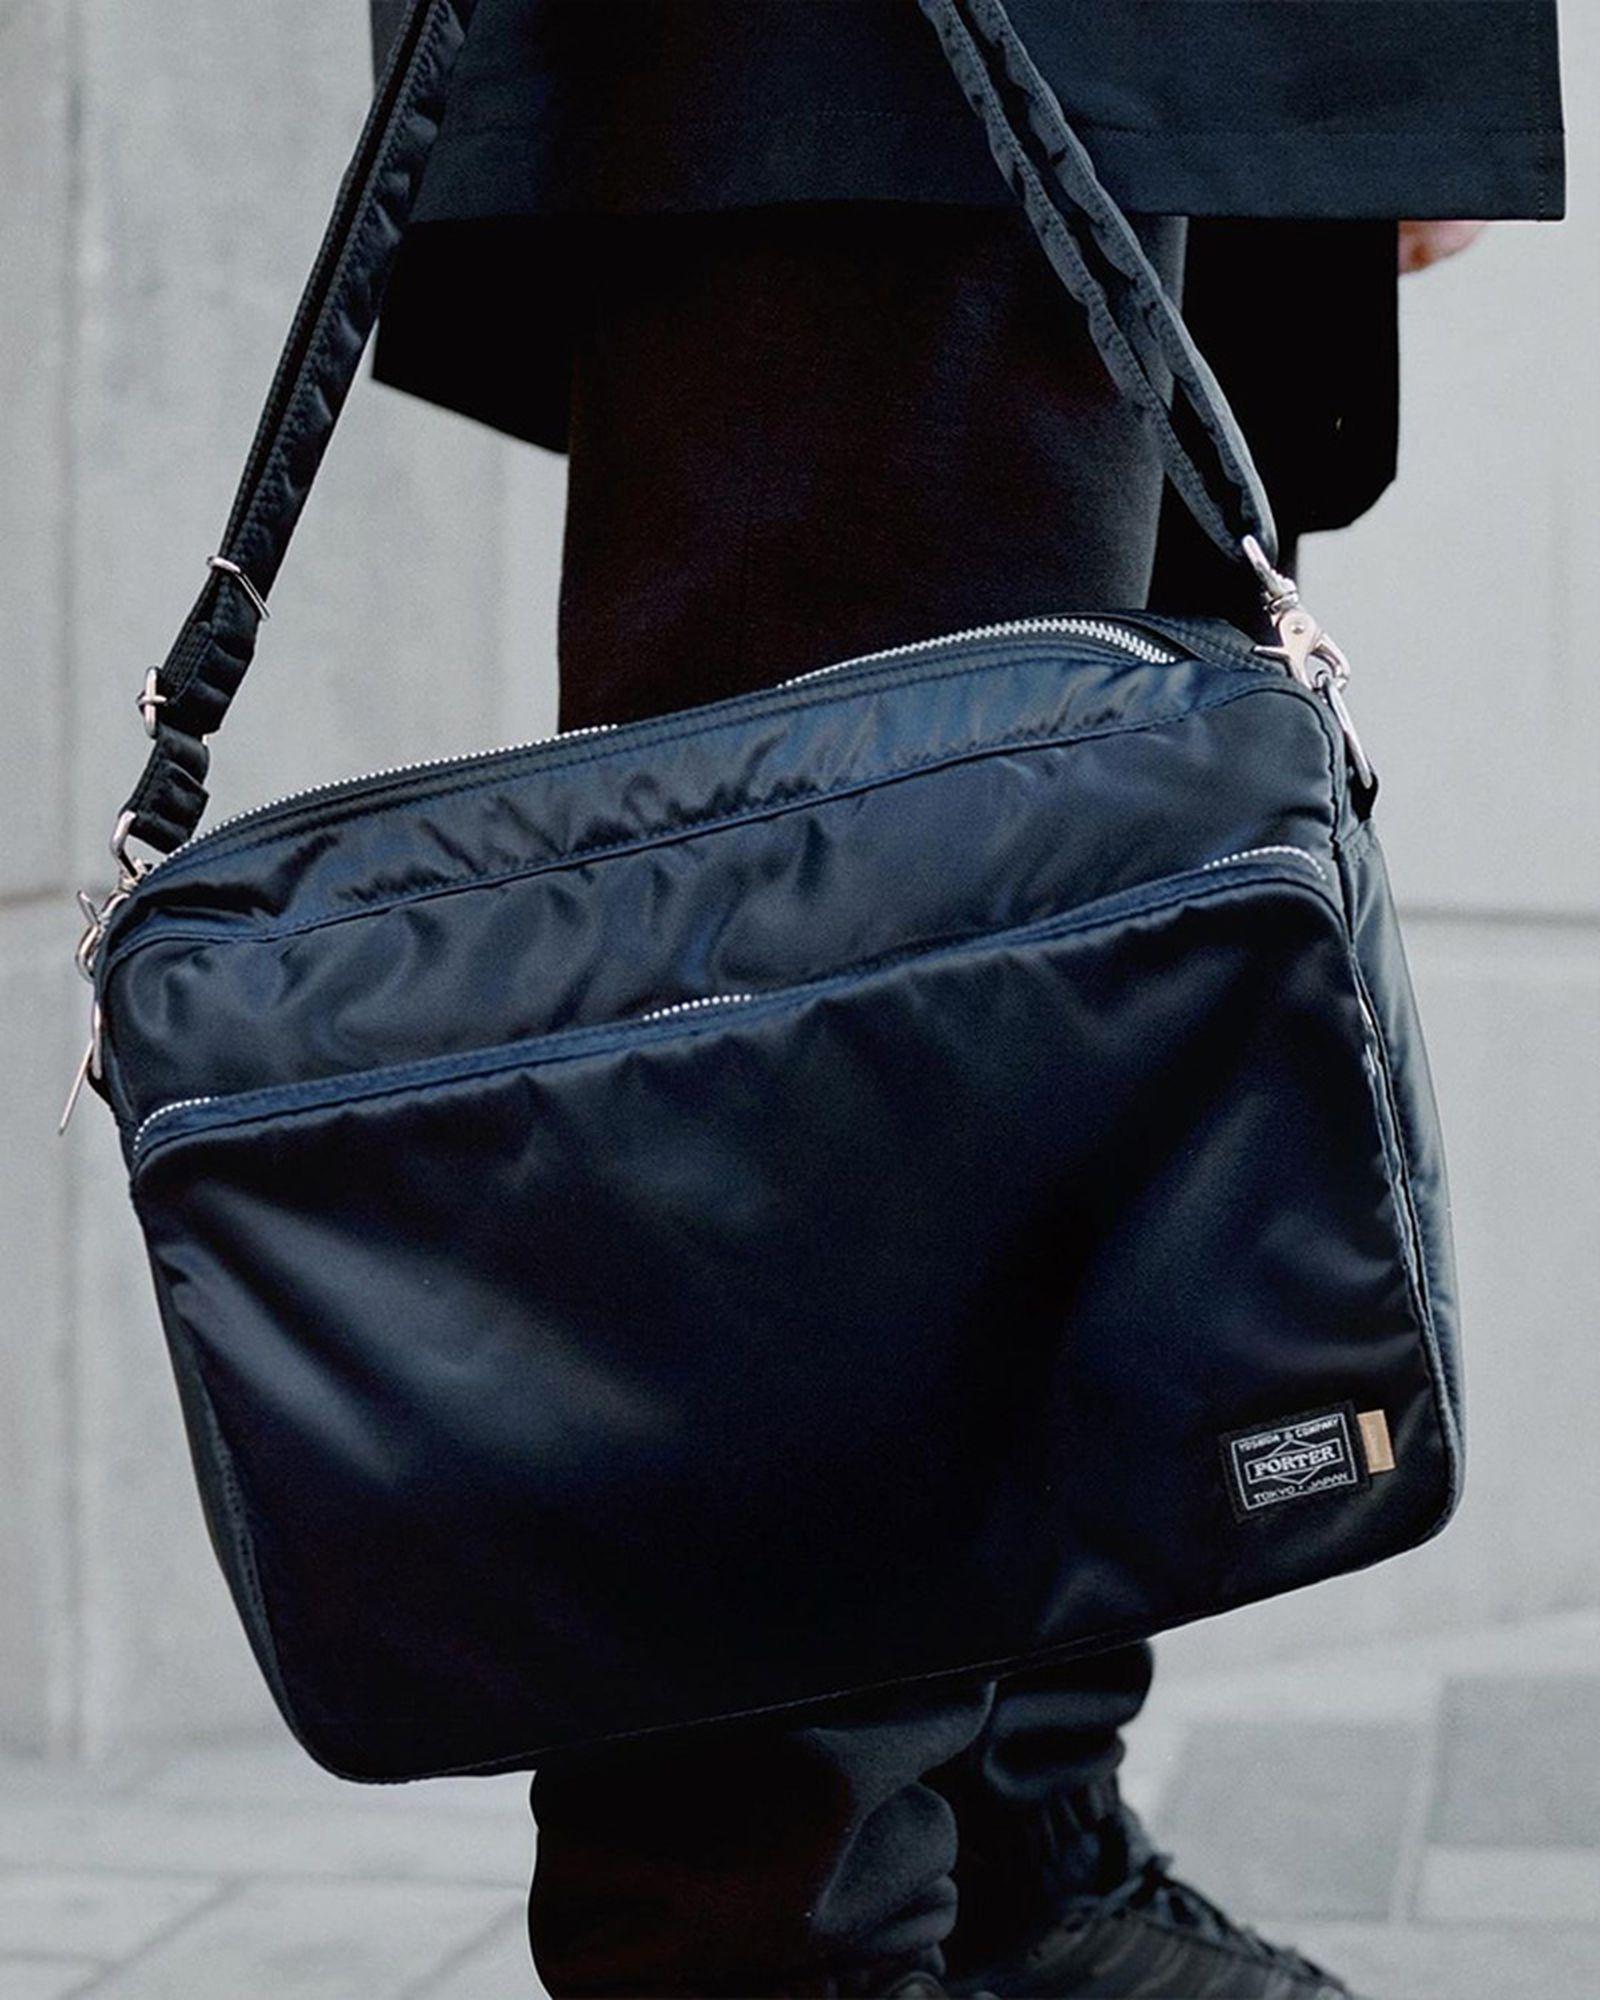 jjjjound-porter-bags-release-date-info-05